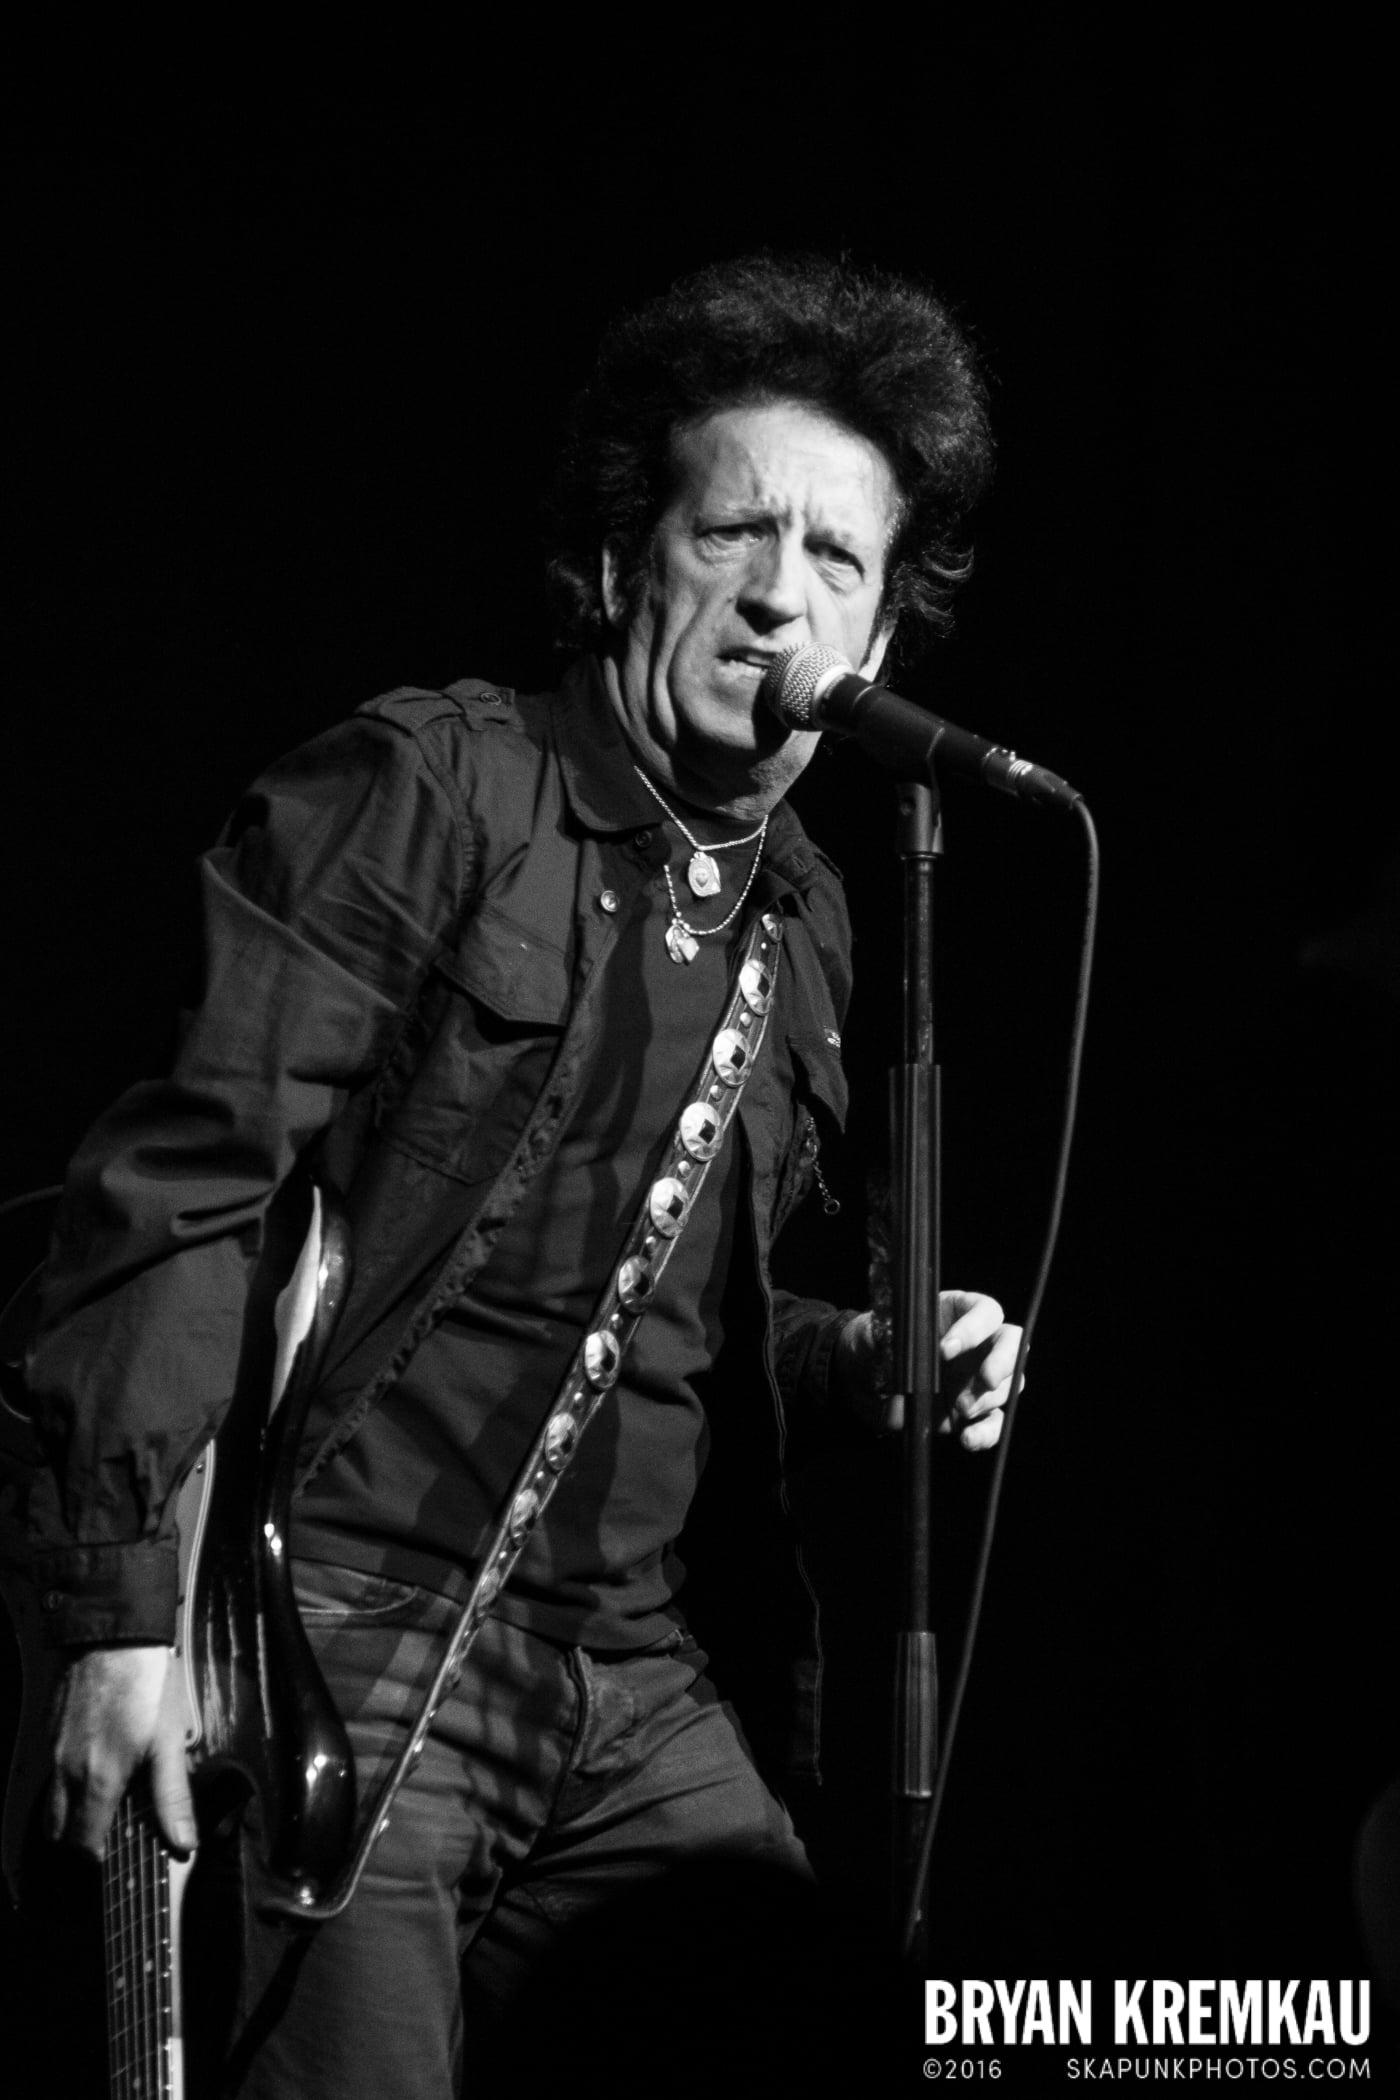 Willie Nile @ Highline Ballroom, NYC - 12.26.14 (70)